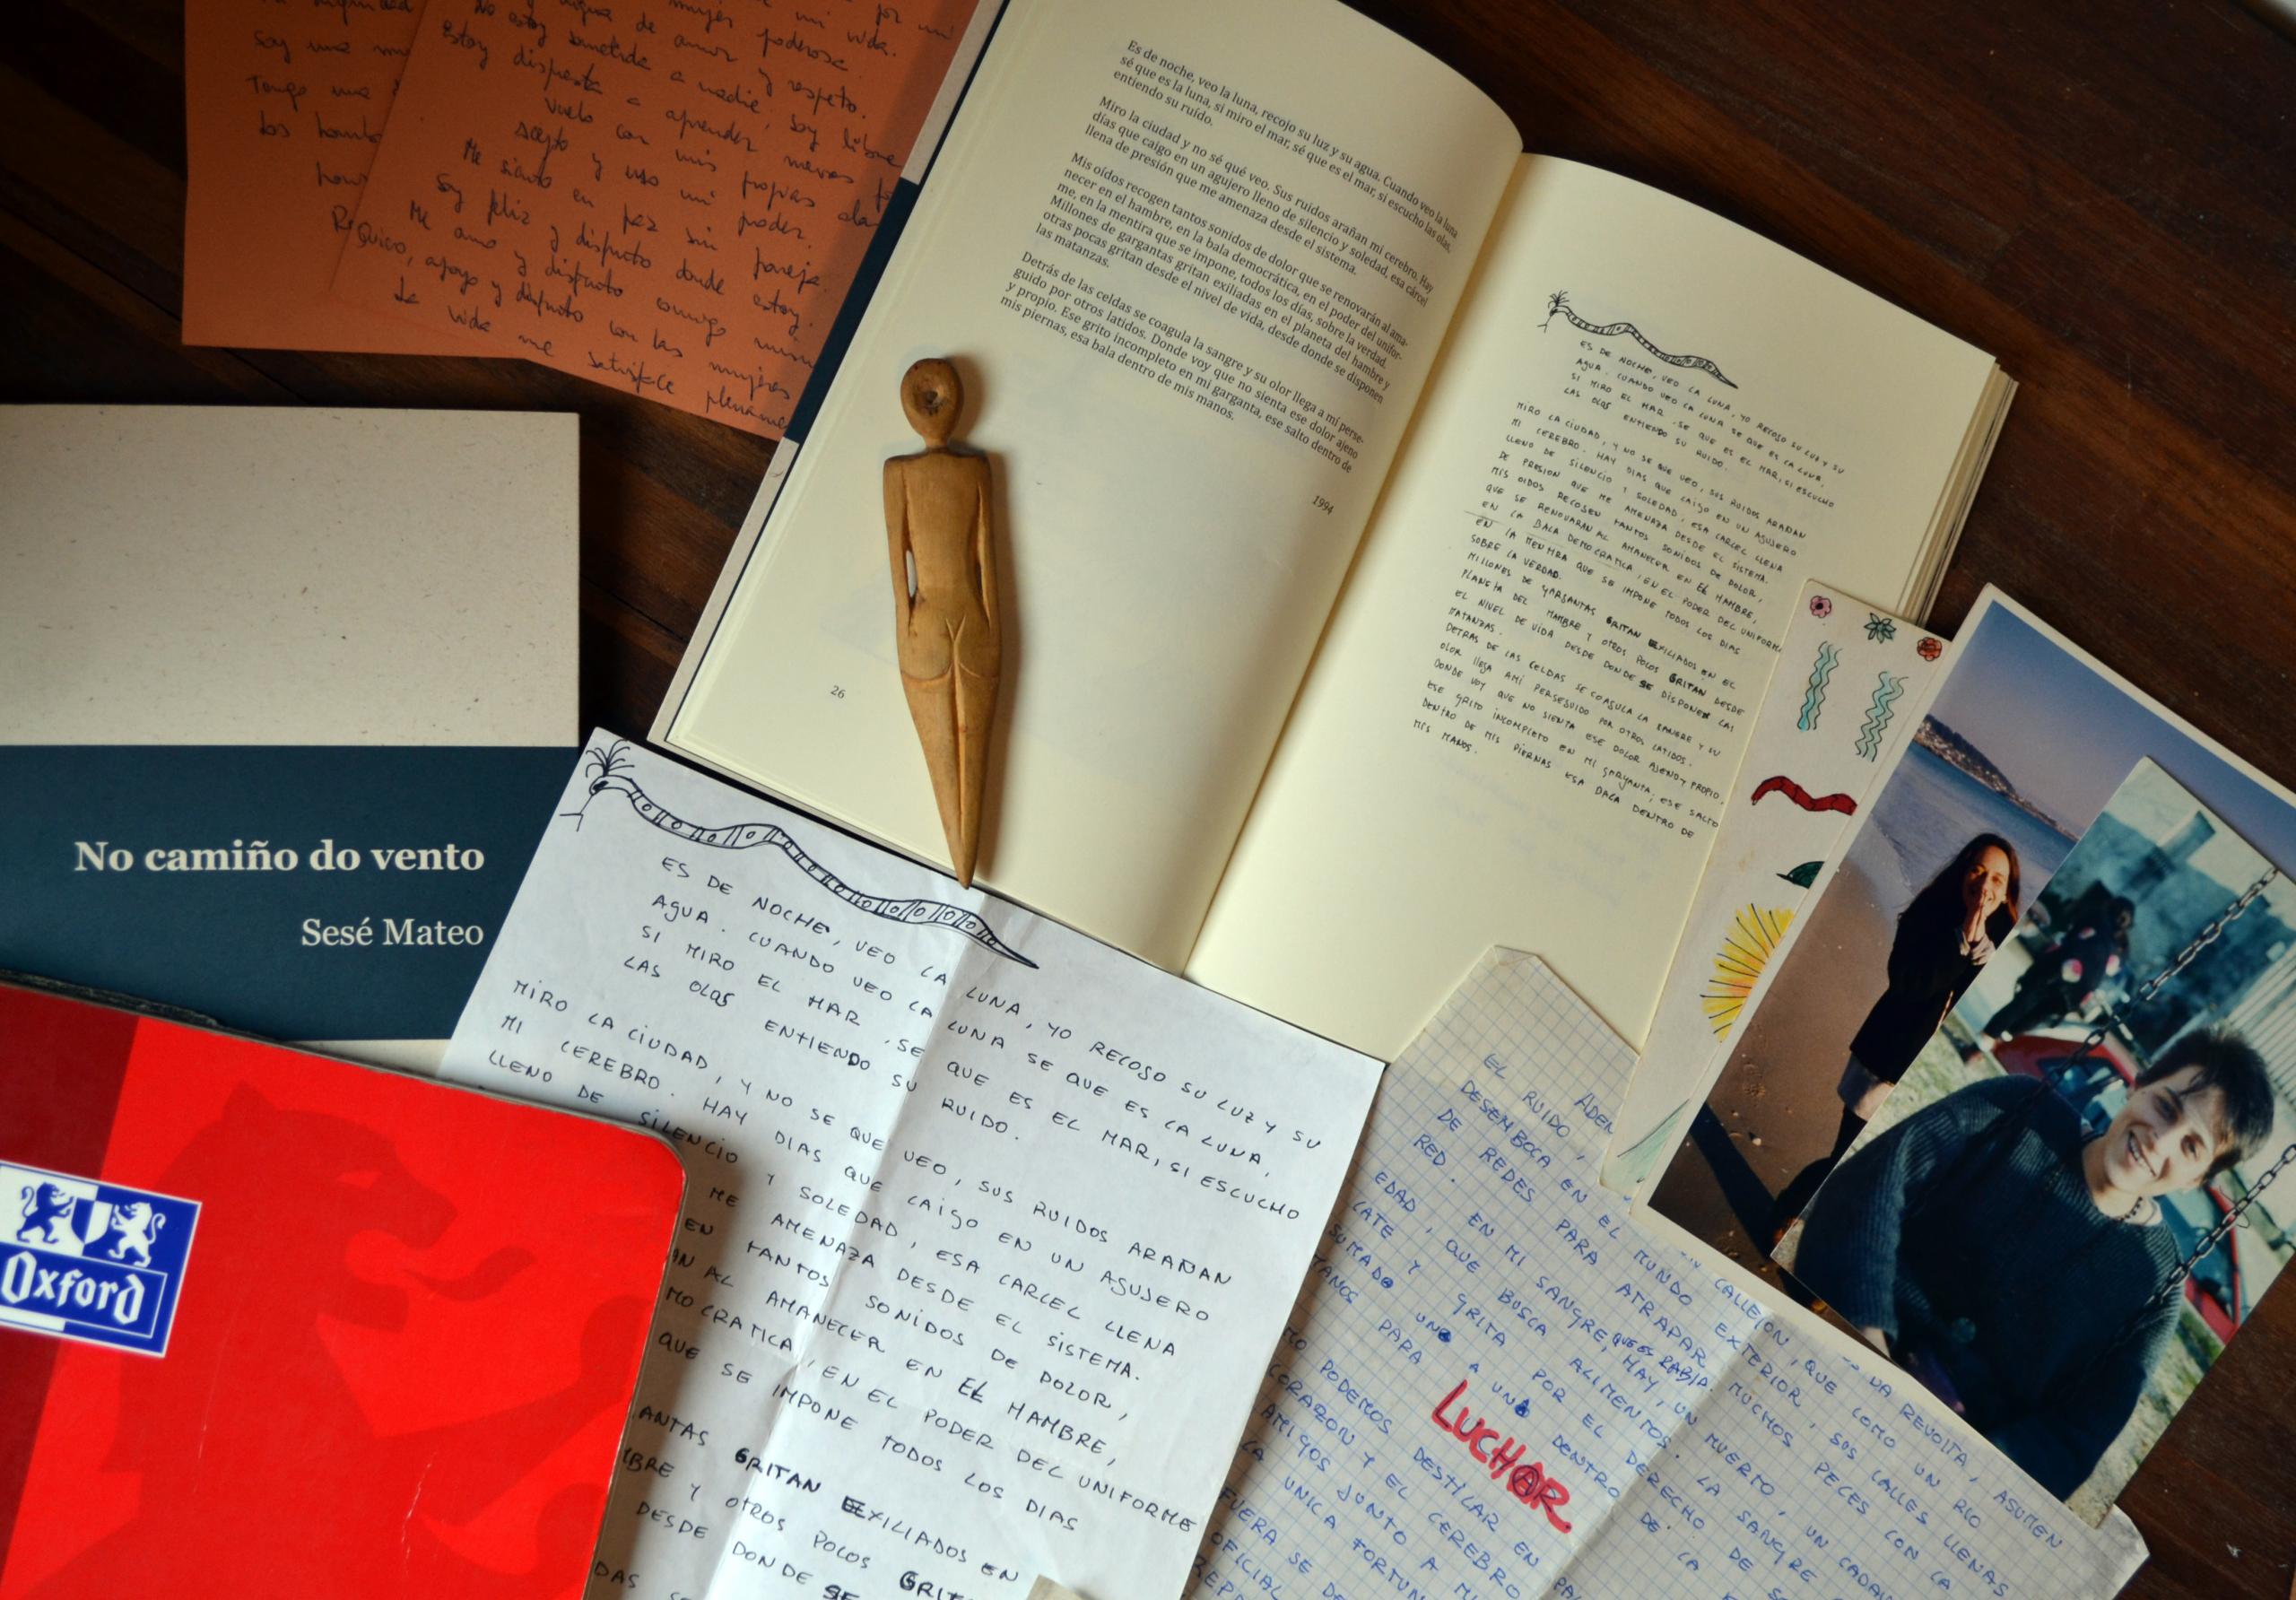 Material utilizado para el libro No camiño do vento